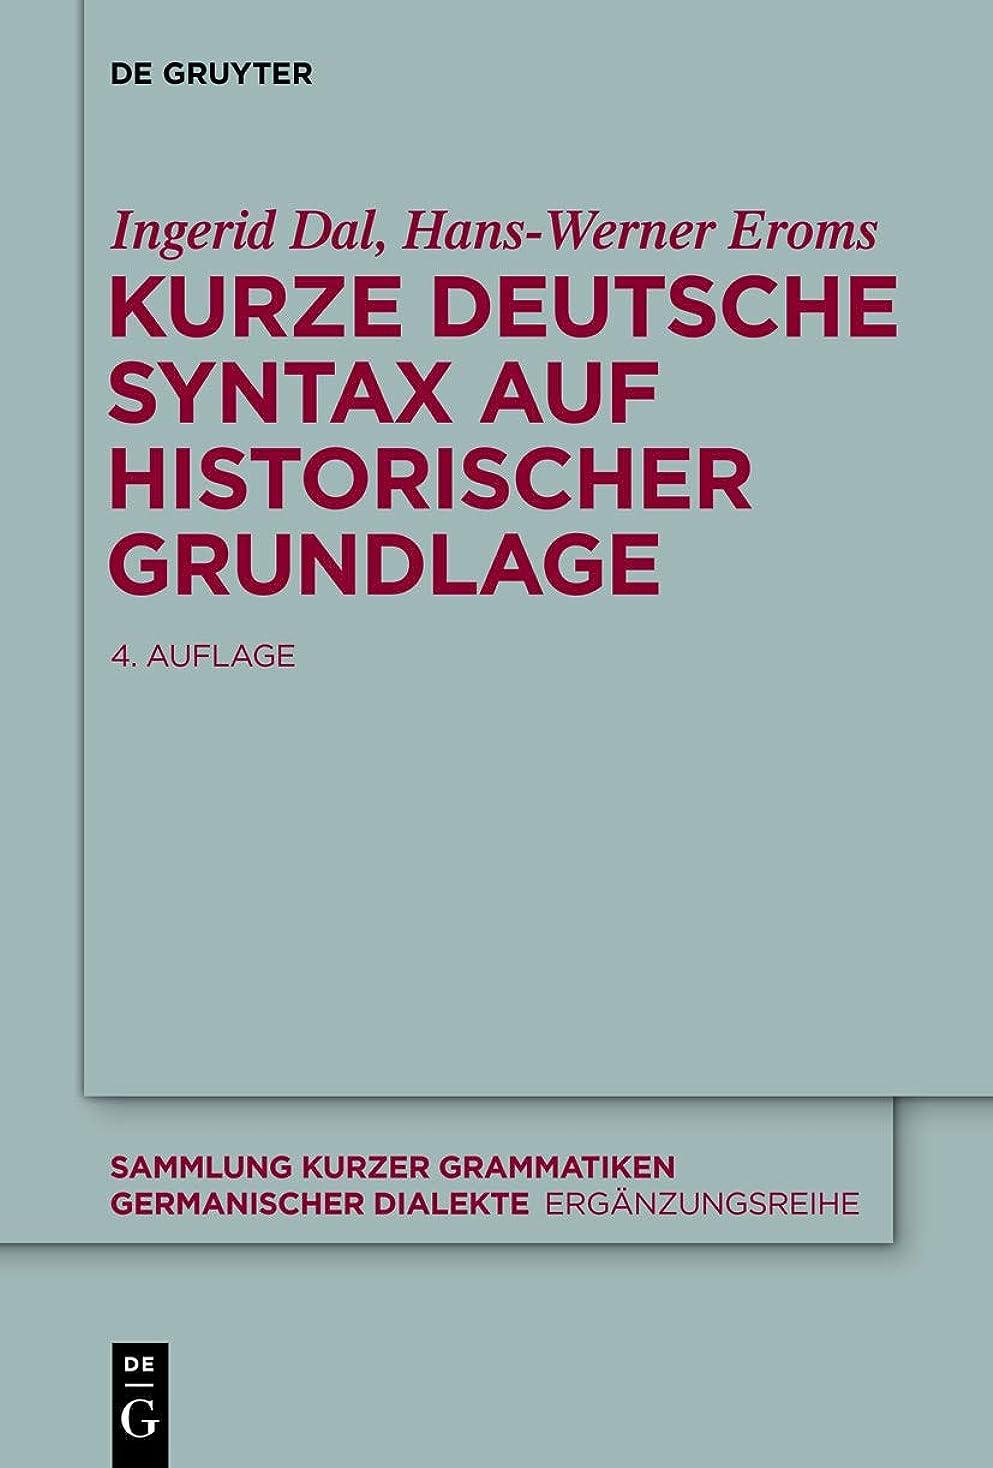 廊下最もスローKurze deutsche Syntax auf historischer Grundlage (Sammlung kurzer Grammatiken germanischer Dialekte. B: Erg?nzungsreihe 7) (German Edition)